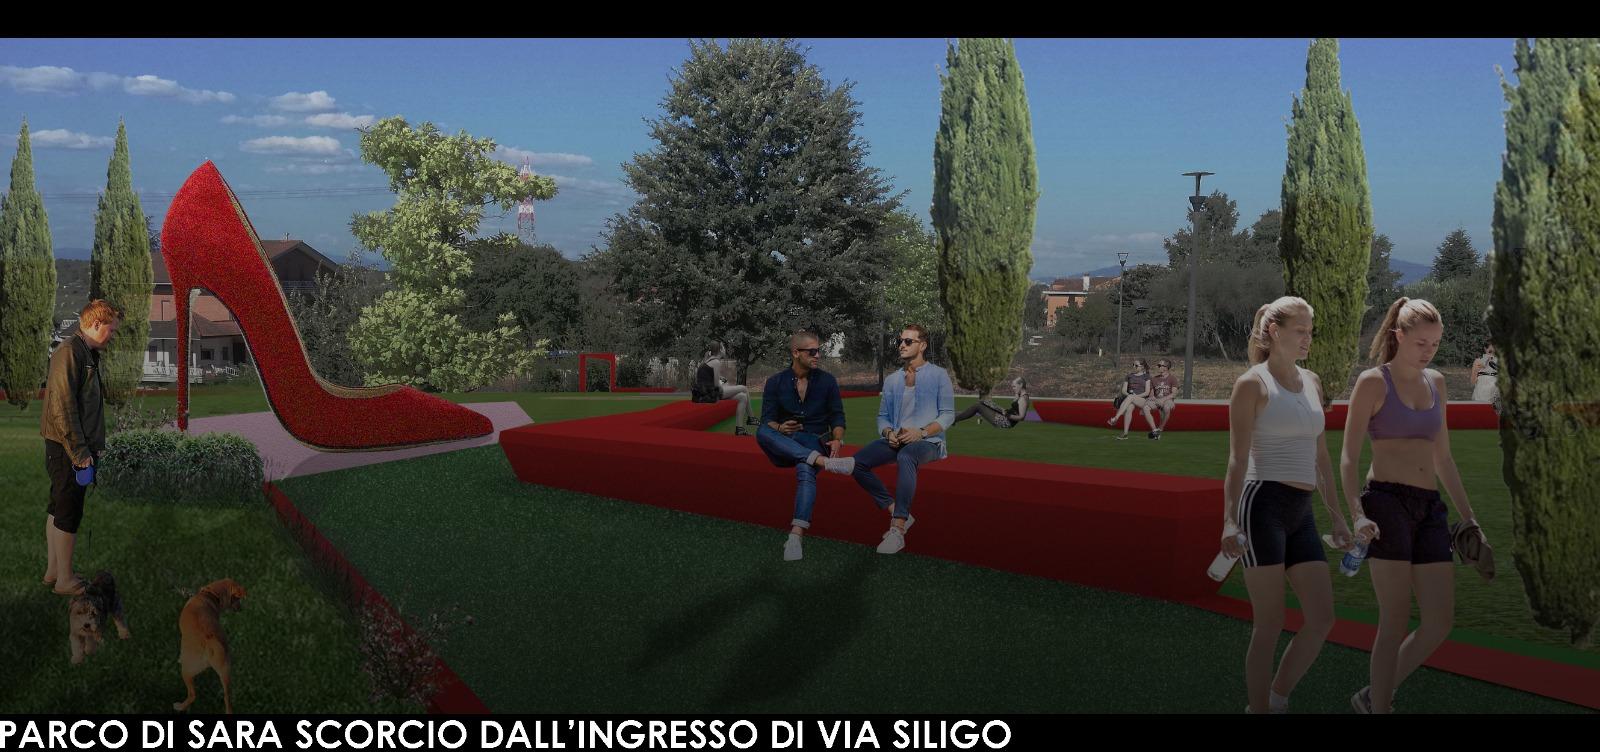 PARCO DI SARA- SPALLETTE - SCORCIO VIA SILIGO